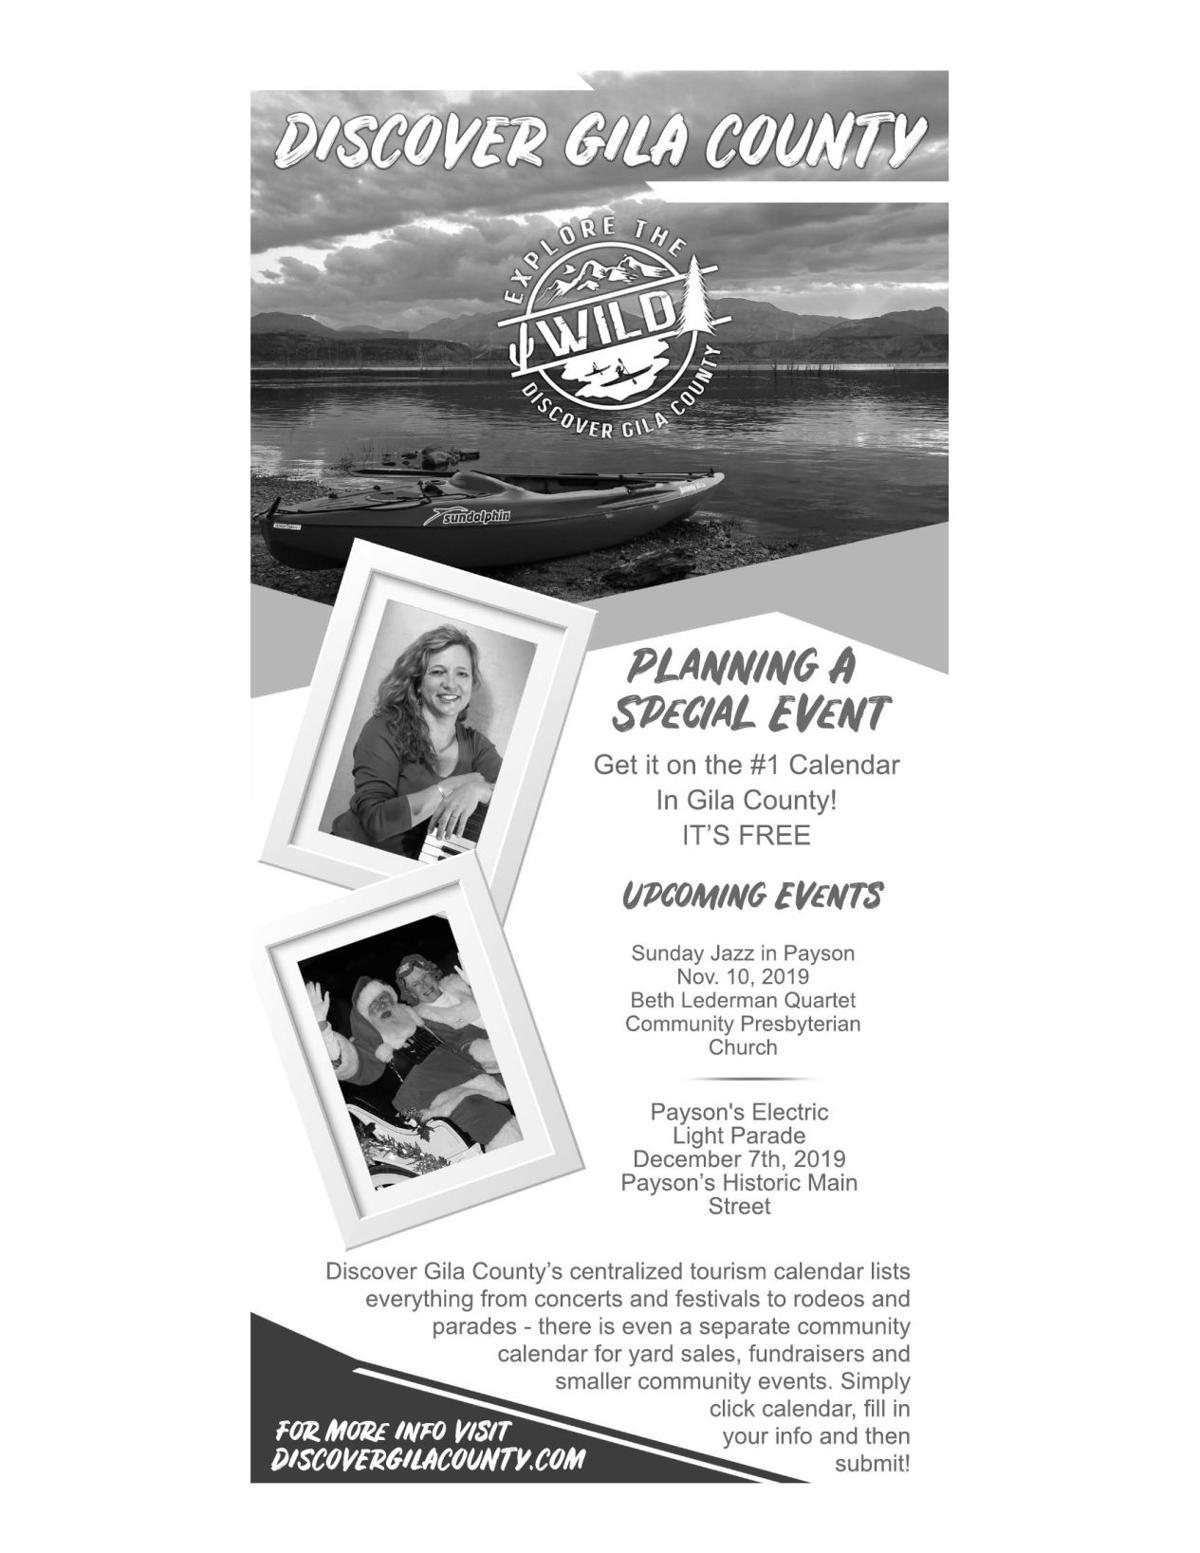 Discover Gila County